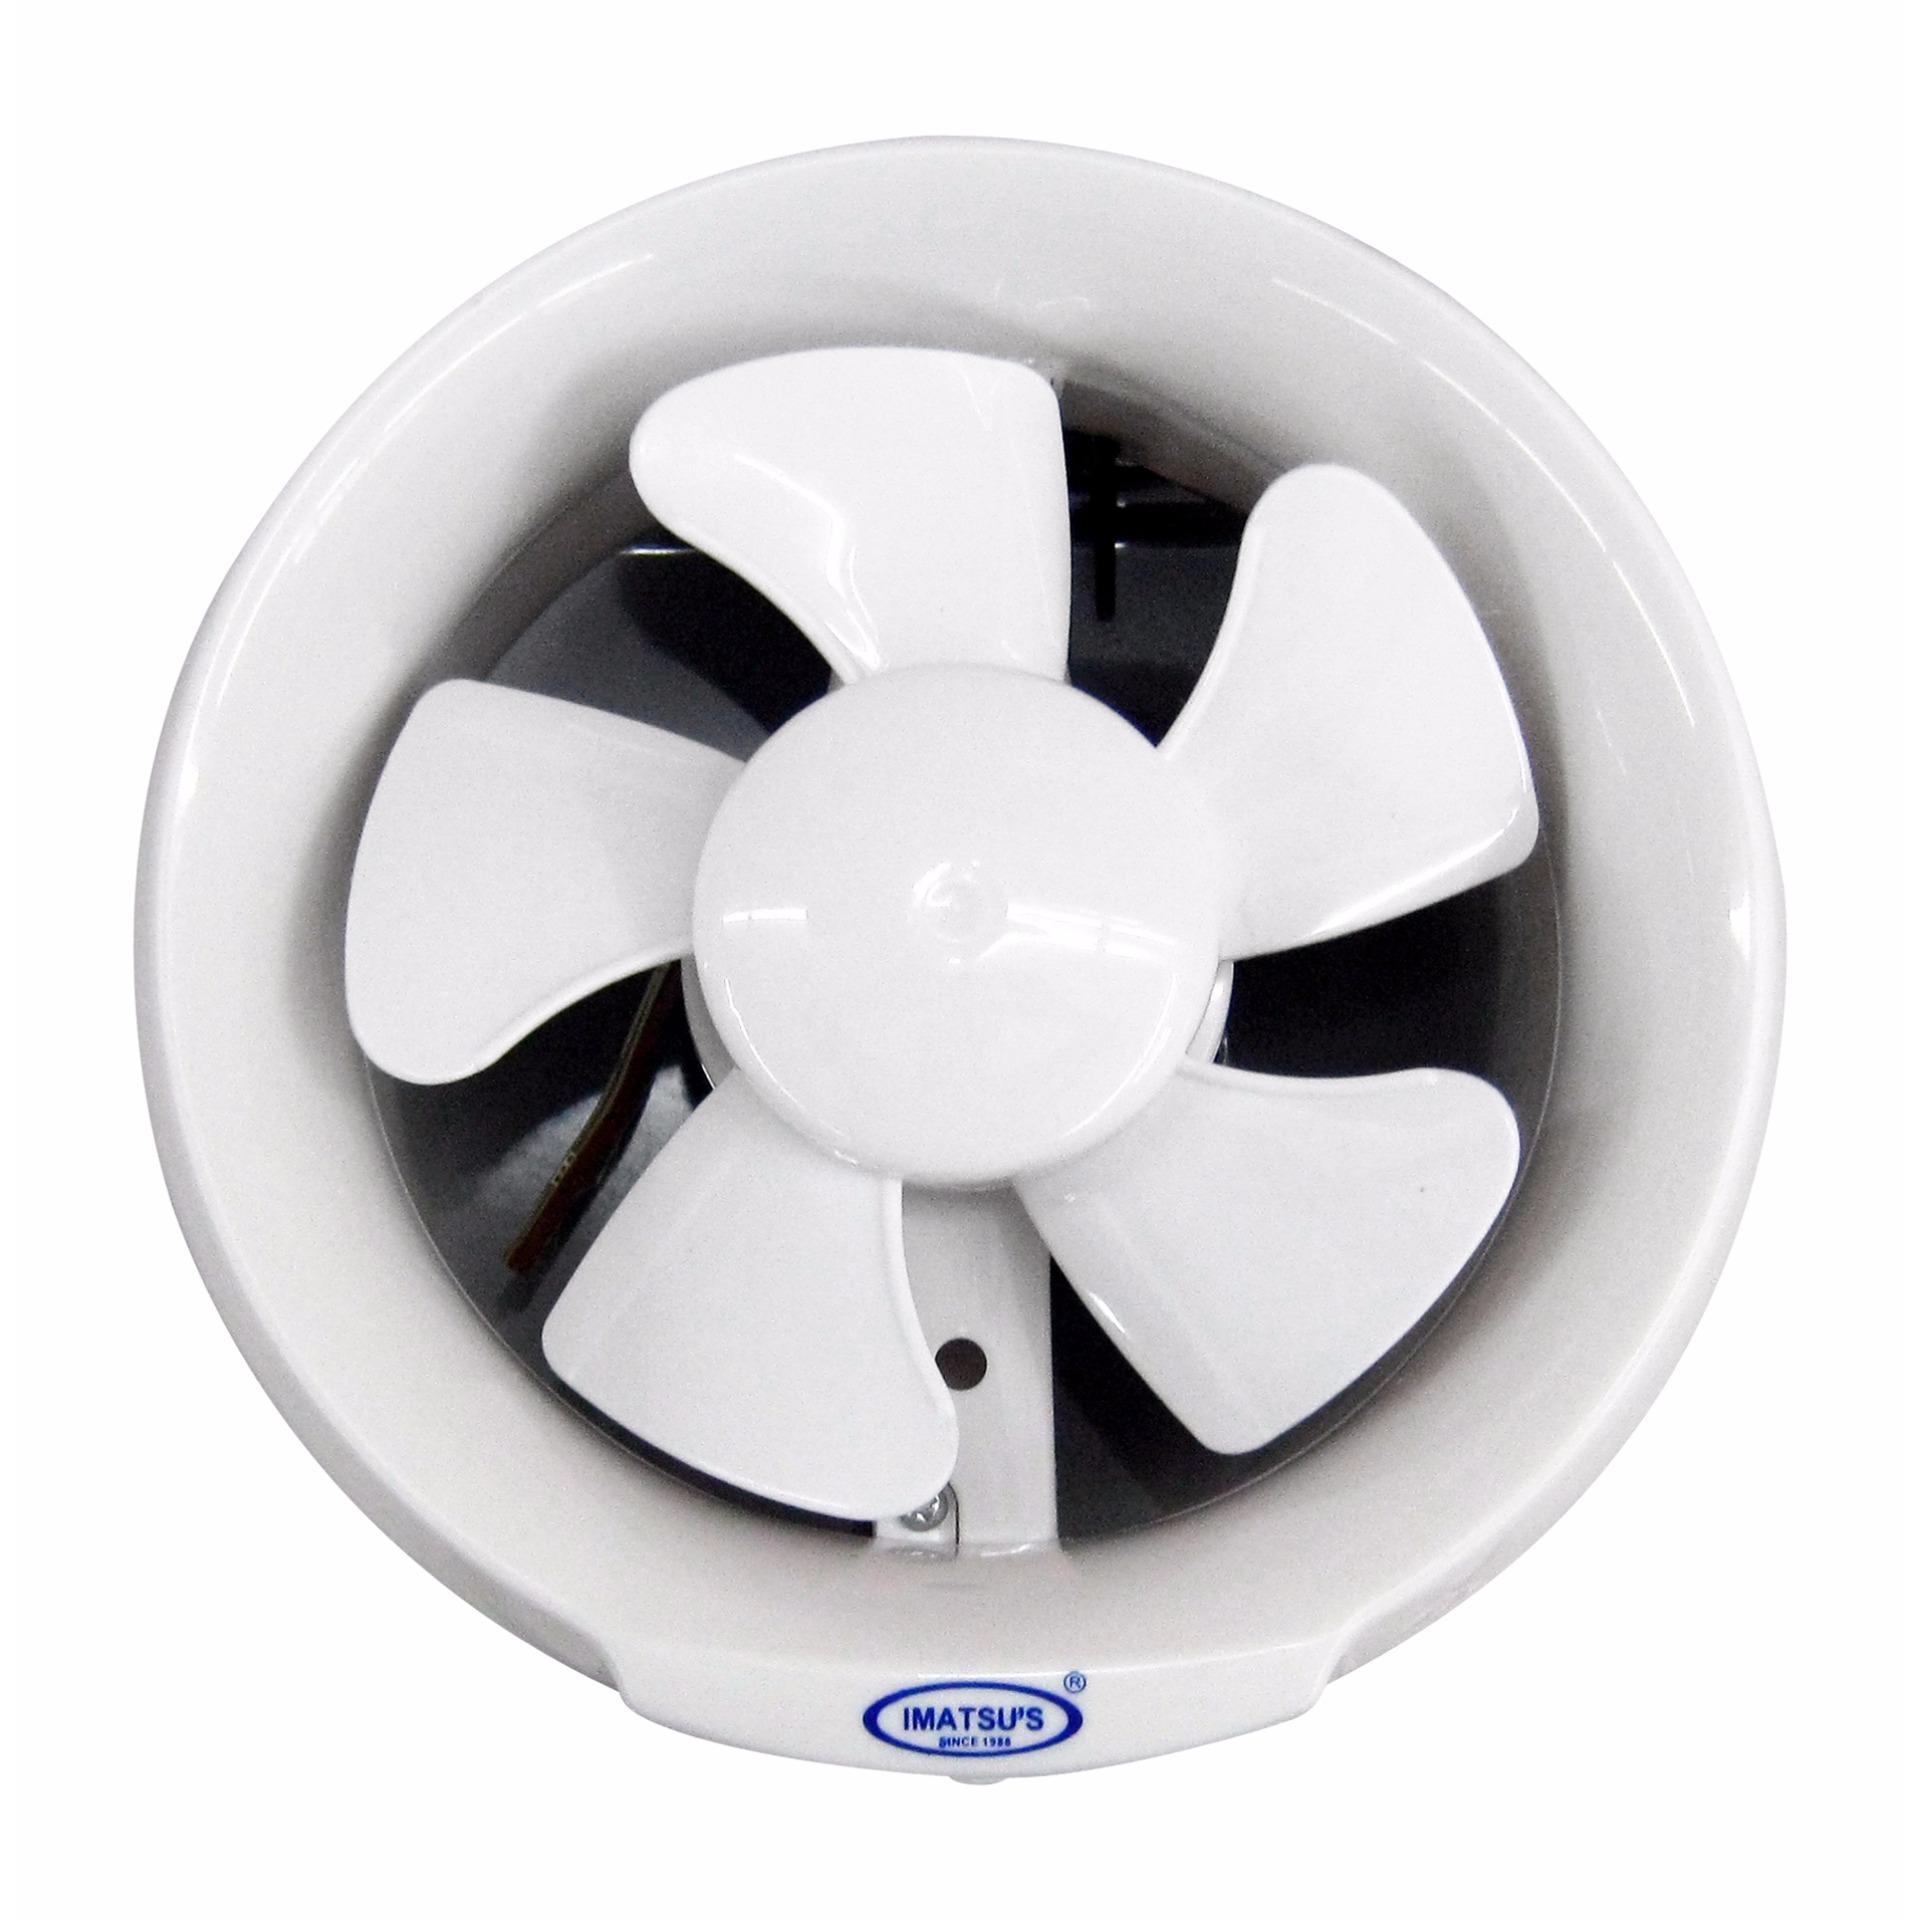 Jual Exhaust Fan Kaca Imatsu Apc15 Ak With Ball Bearing Led 6 Inch Rumah Toilet Dapur Udara Hisap Angin Nyaman Aman Sejuk Dingin Ventilasi Plafon Eksos